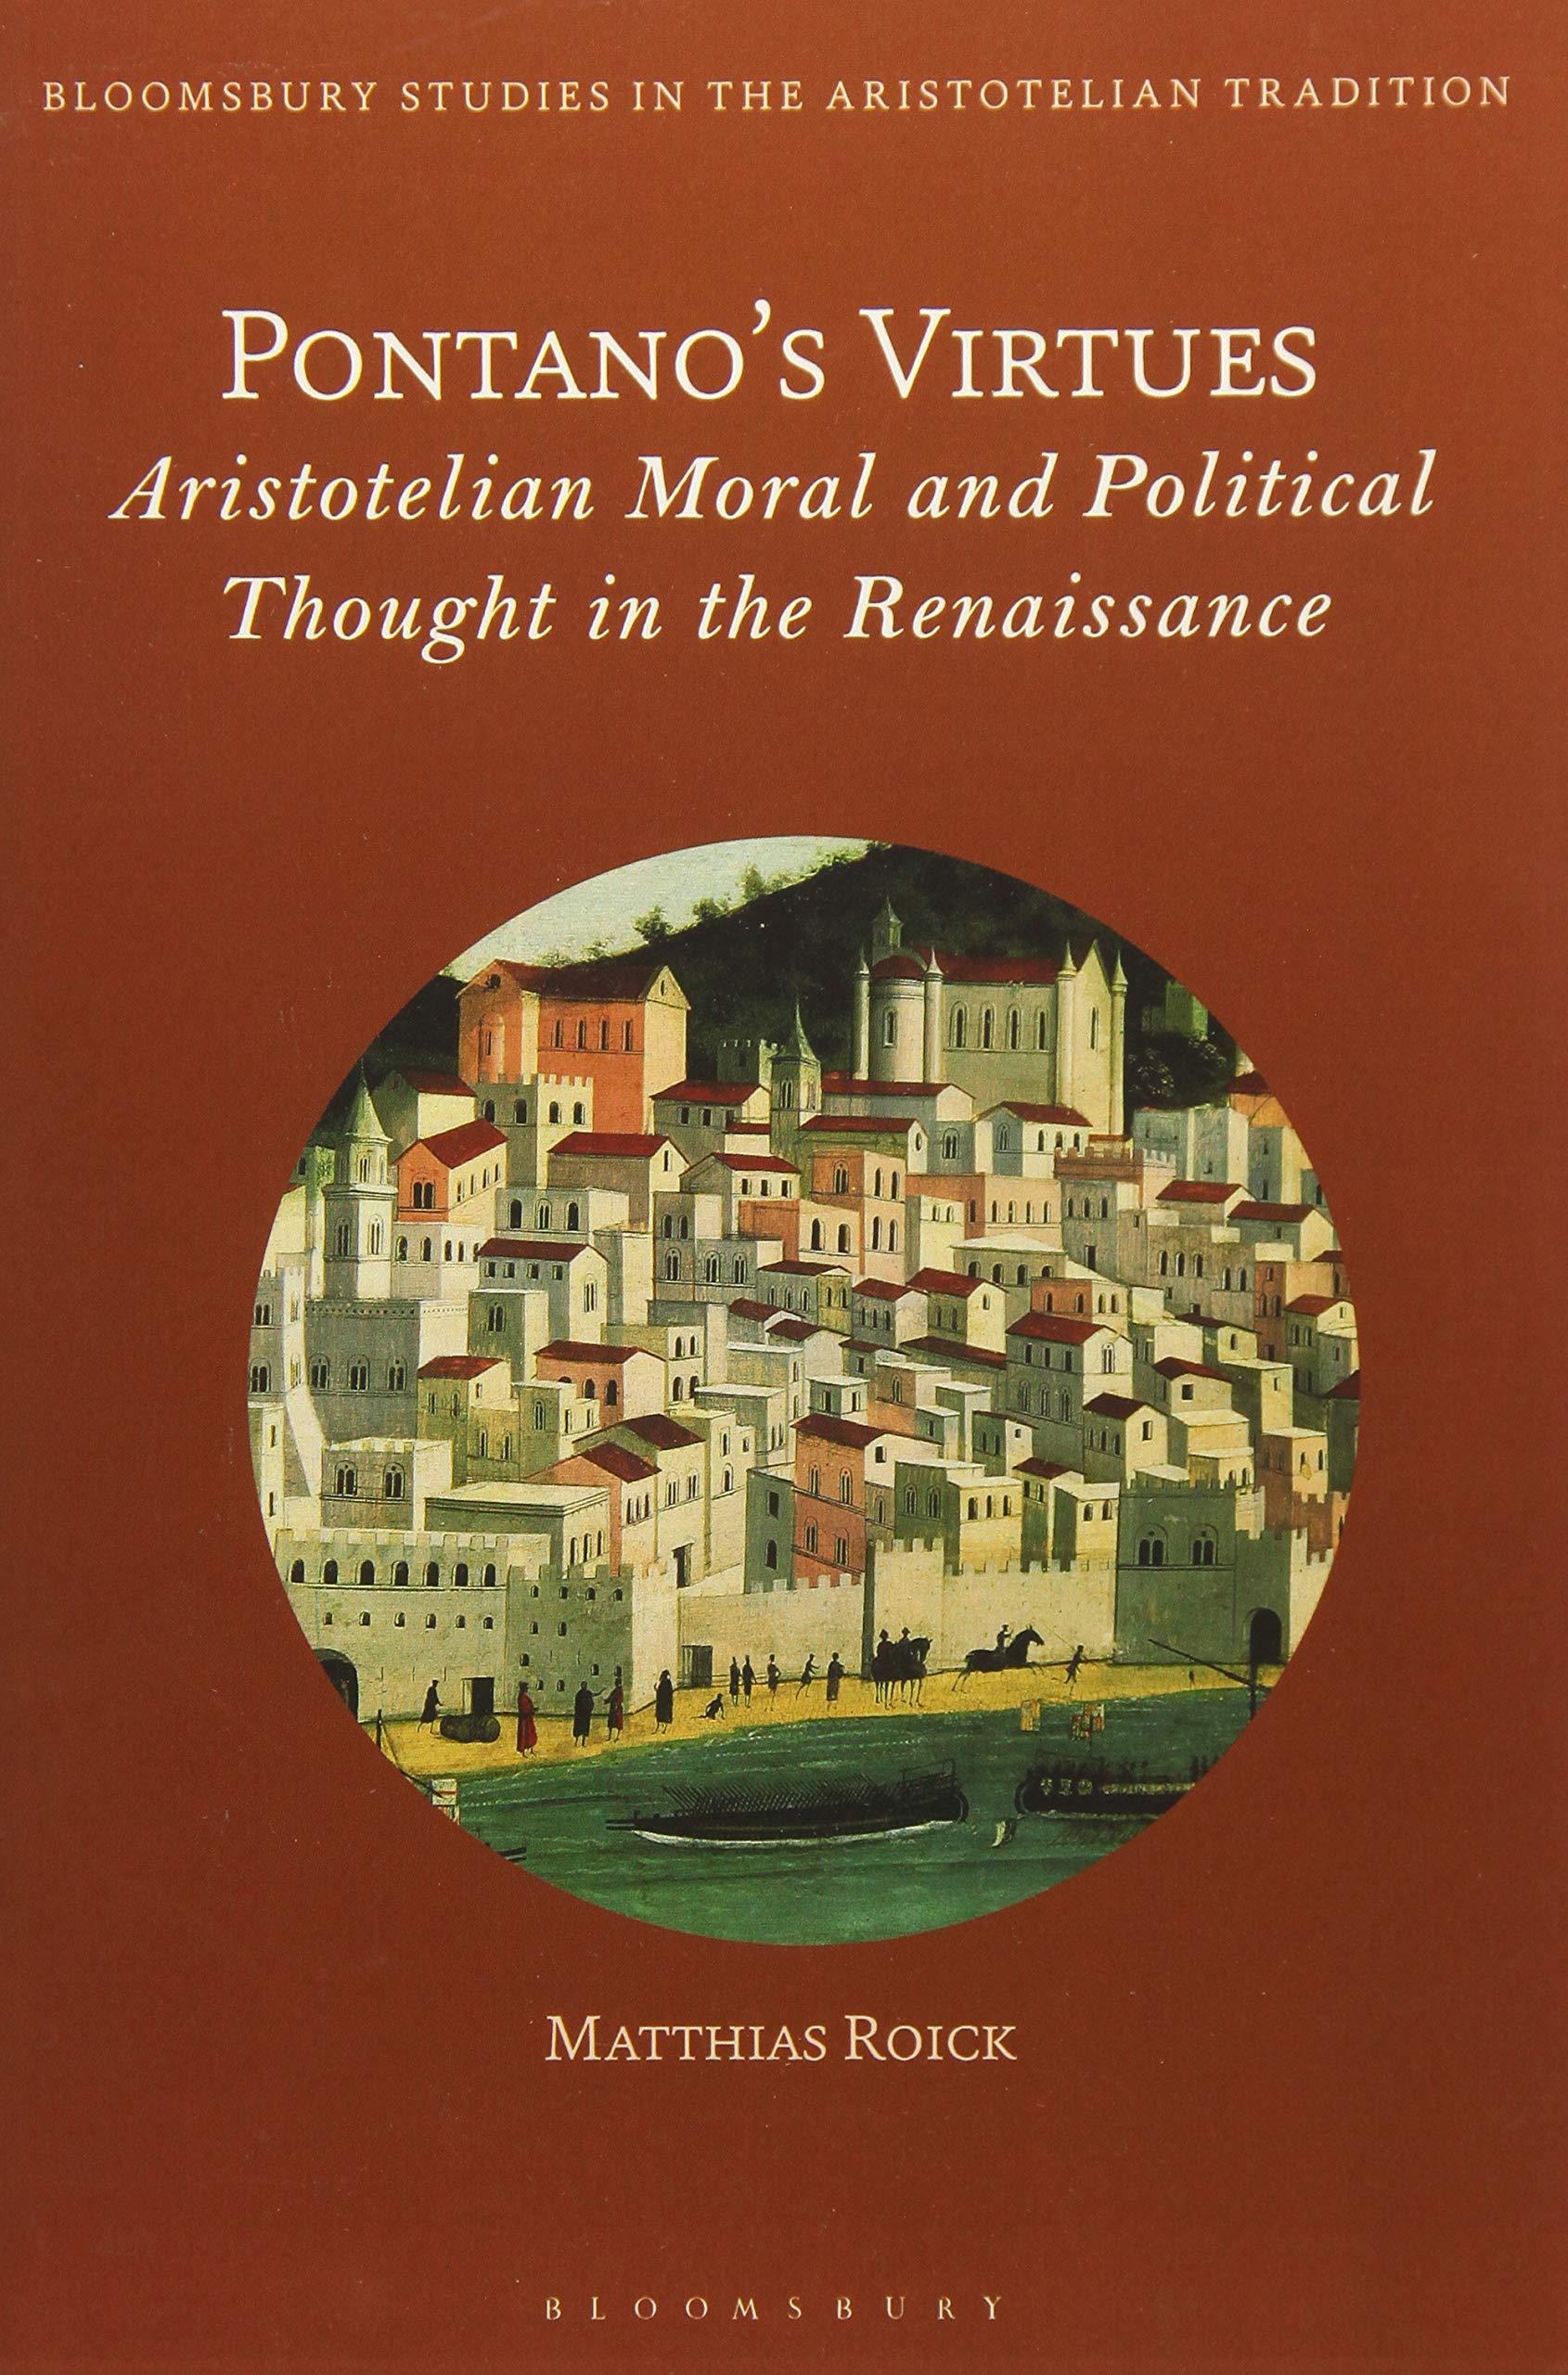 Pontano's Virtues  Bloomsbury Studies In The Aristotelian Tradition